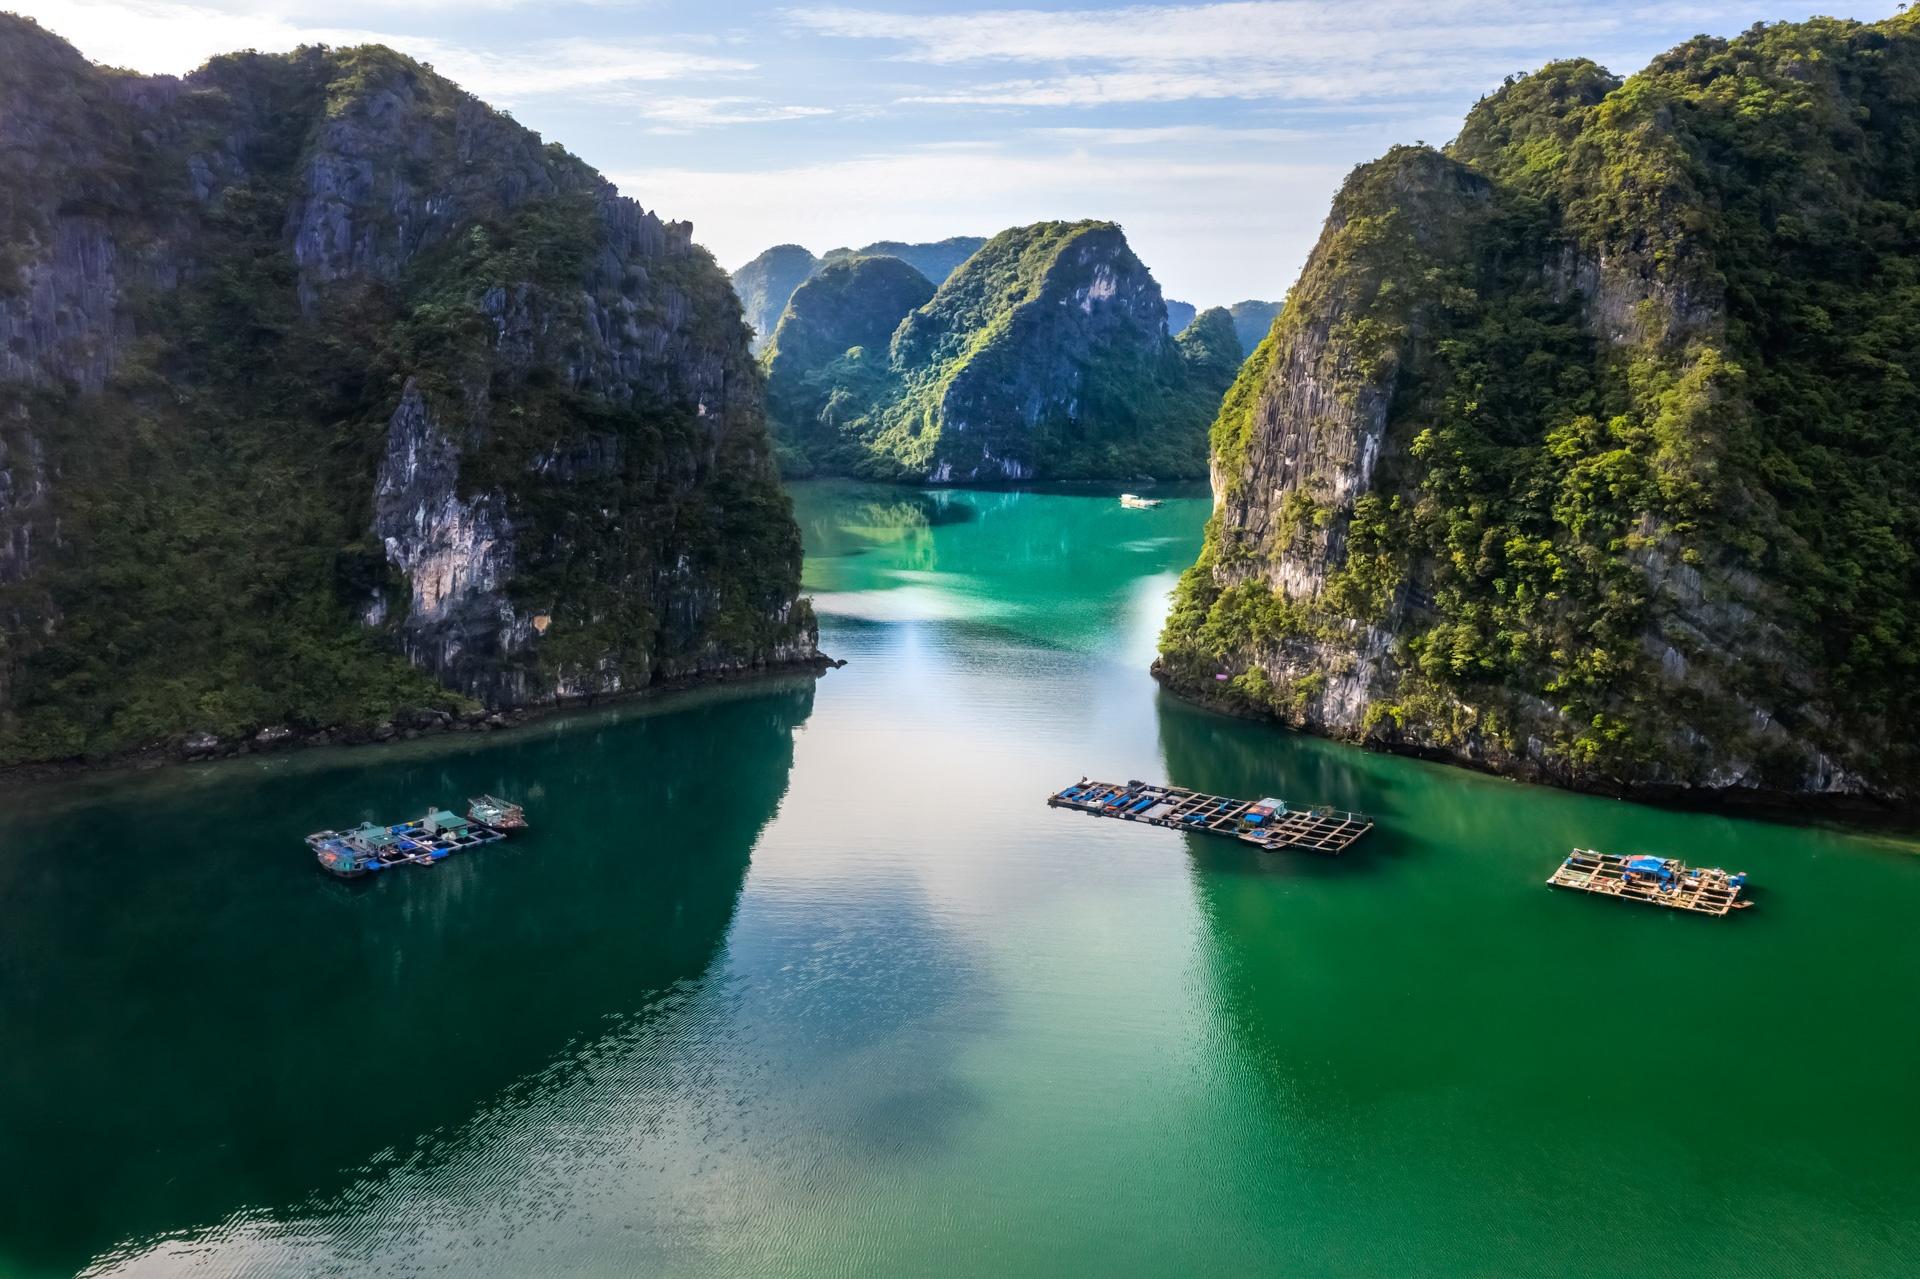 Nhung lang chai du lich o hai vinh dep nhat Quang Ninh hinh anh 9